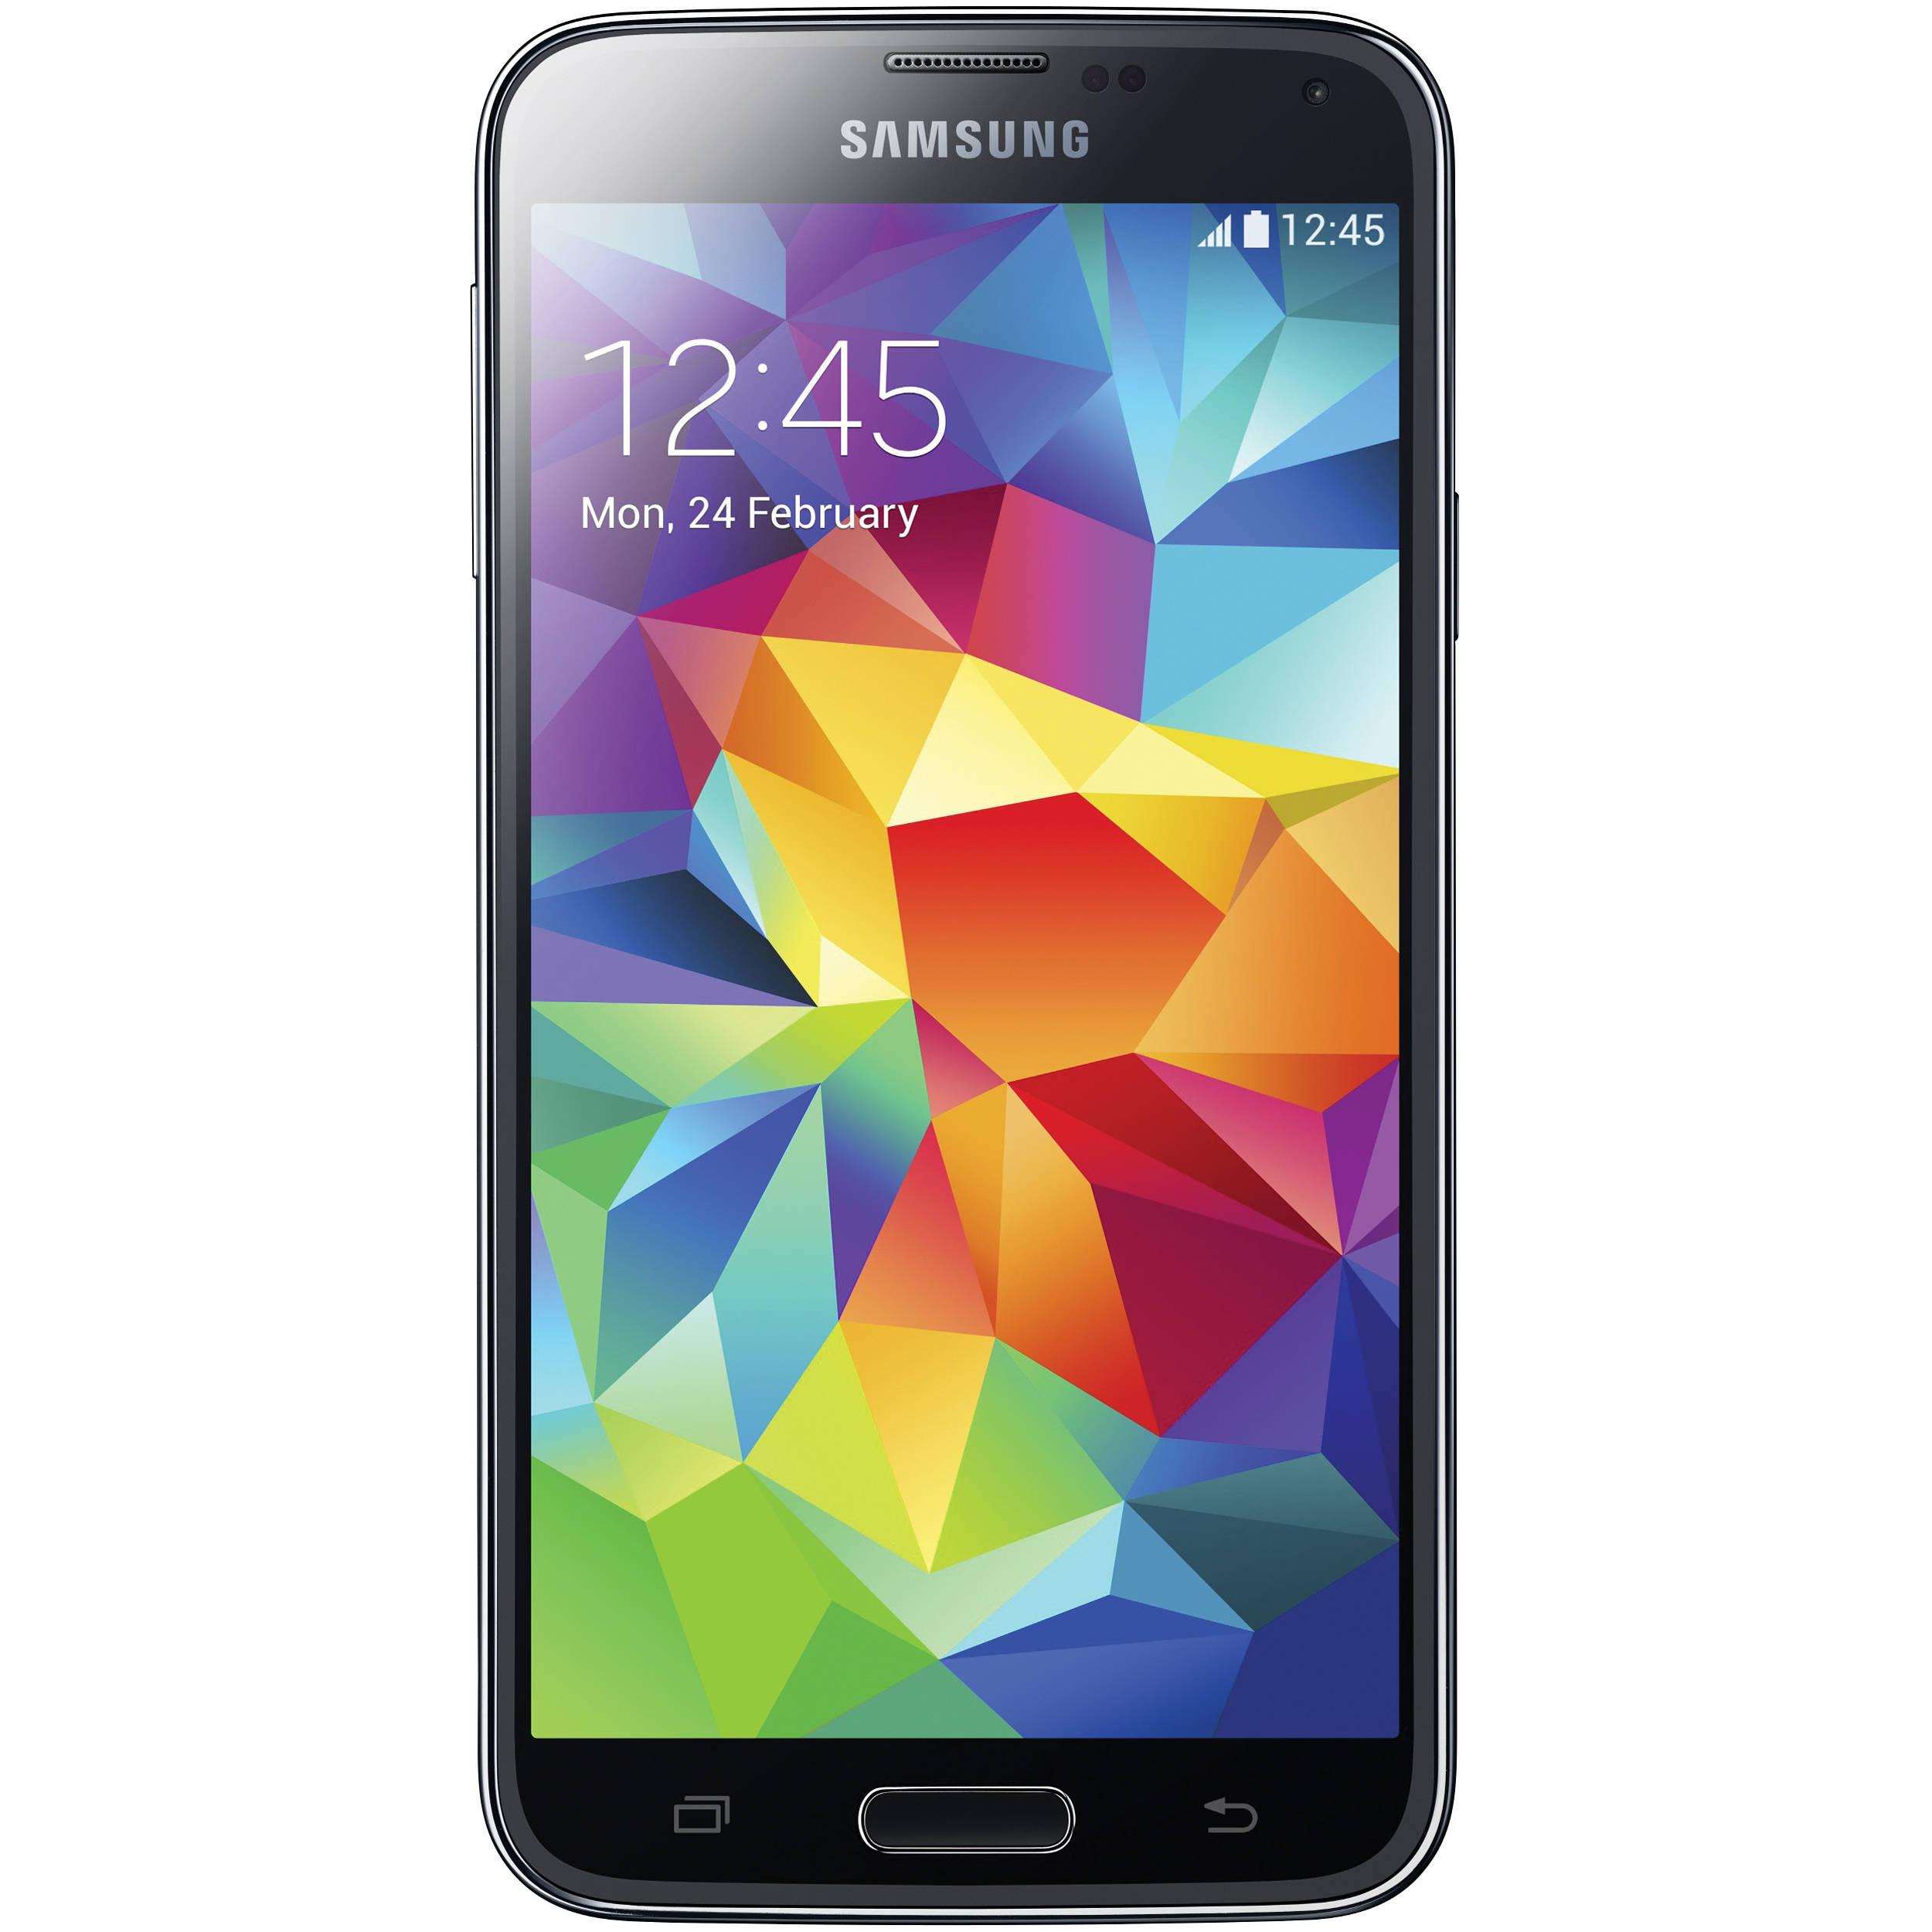 Samsung SM-G900F Image